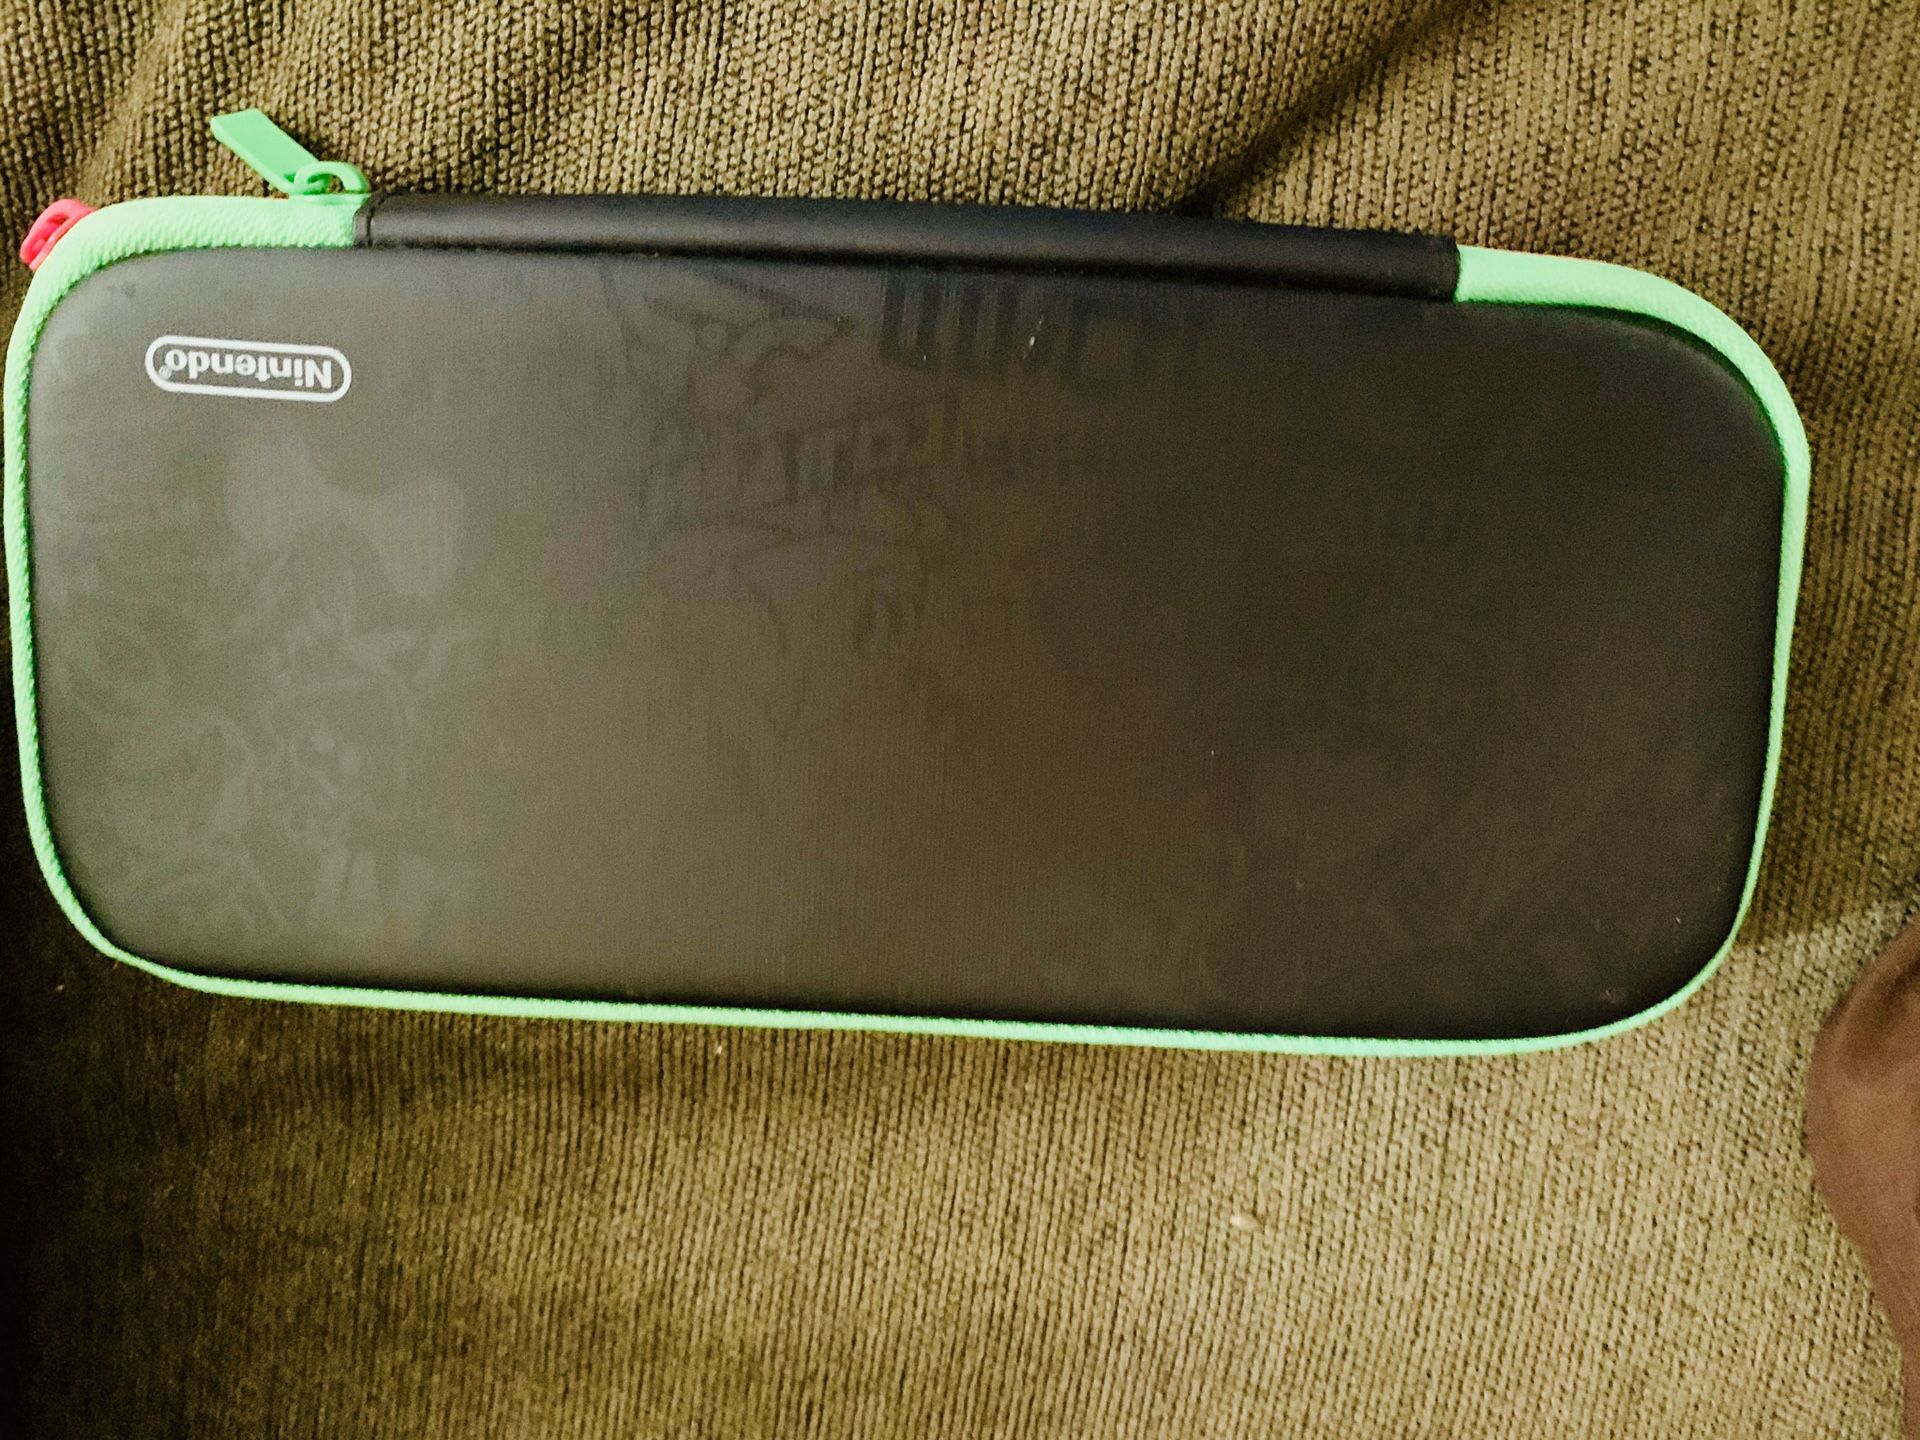 Nintendo switch splatoon edition new